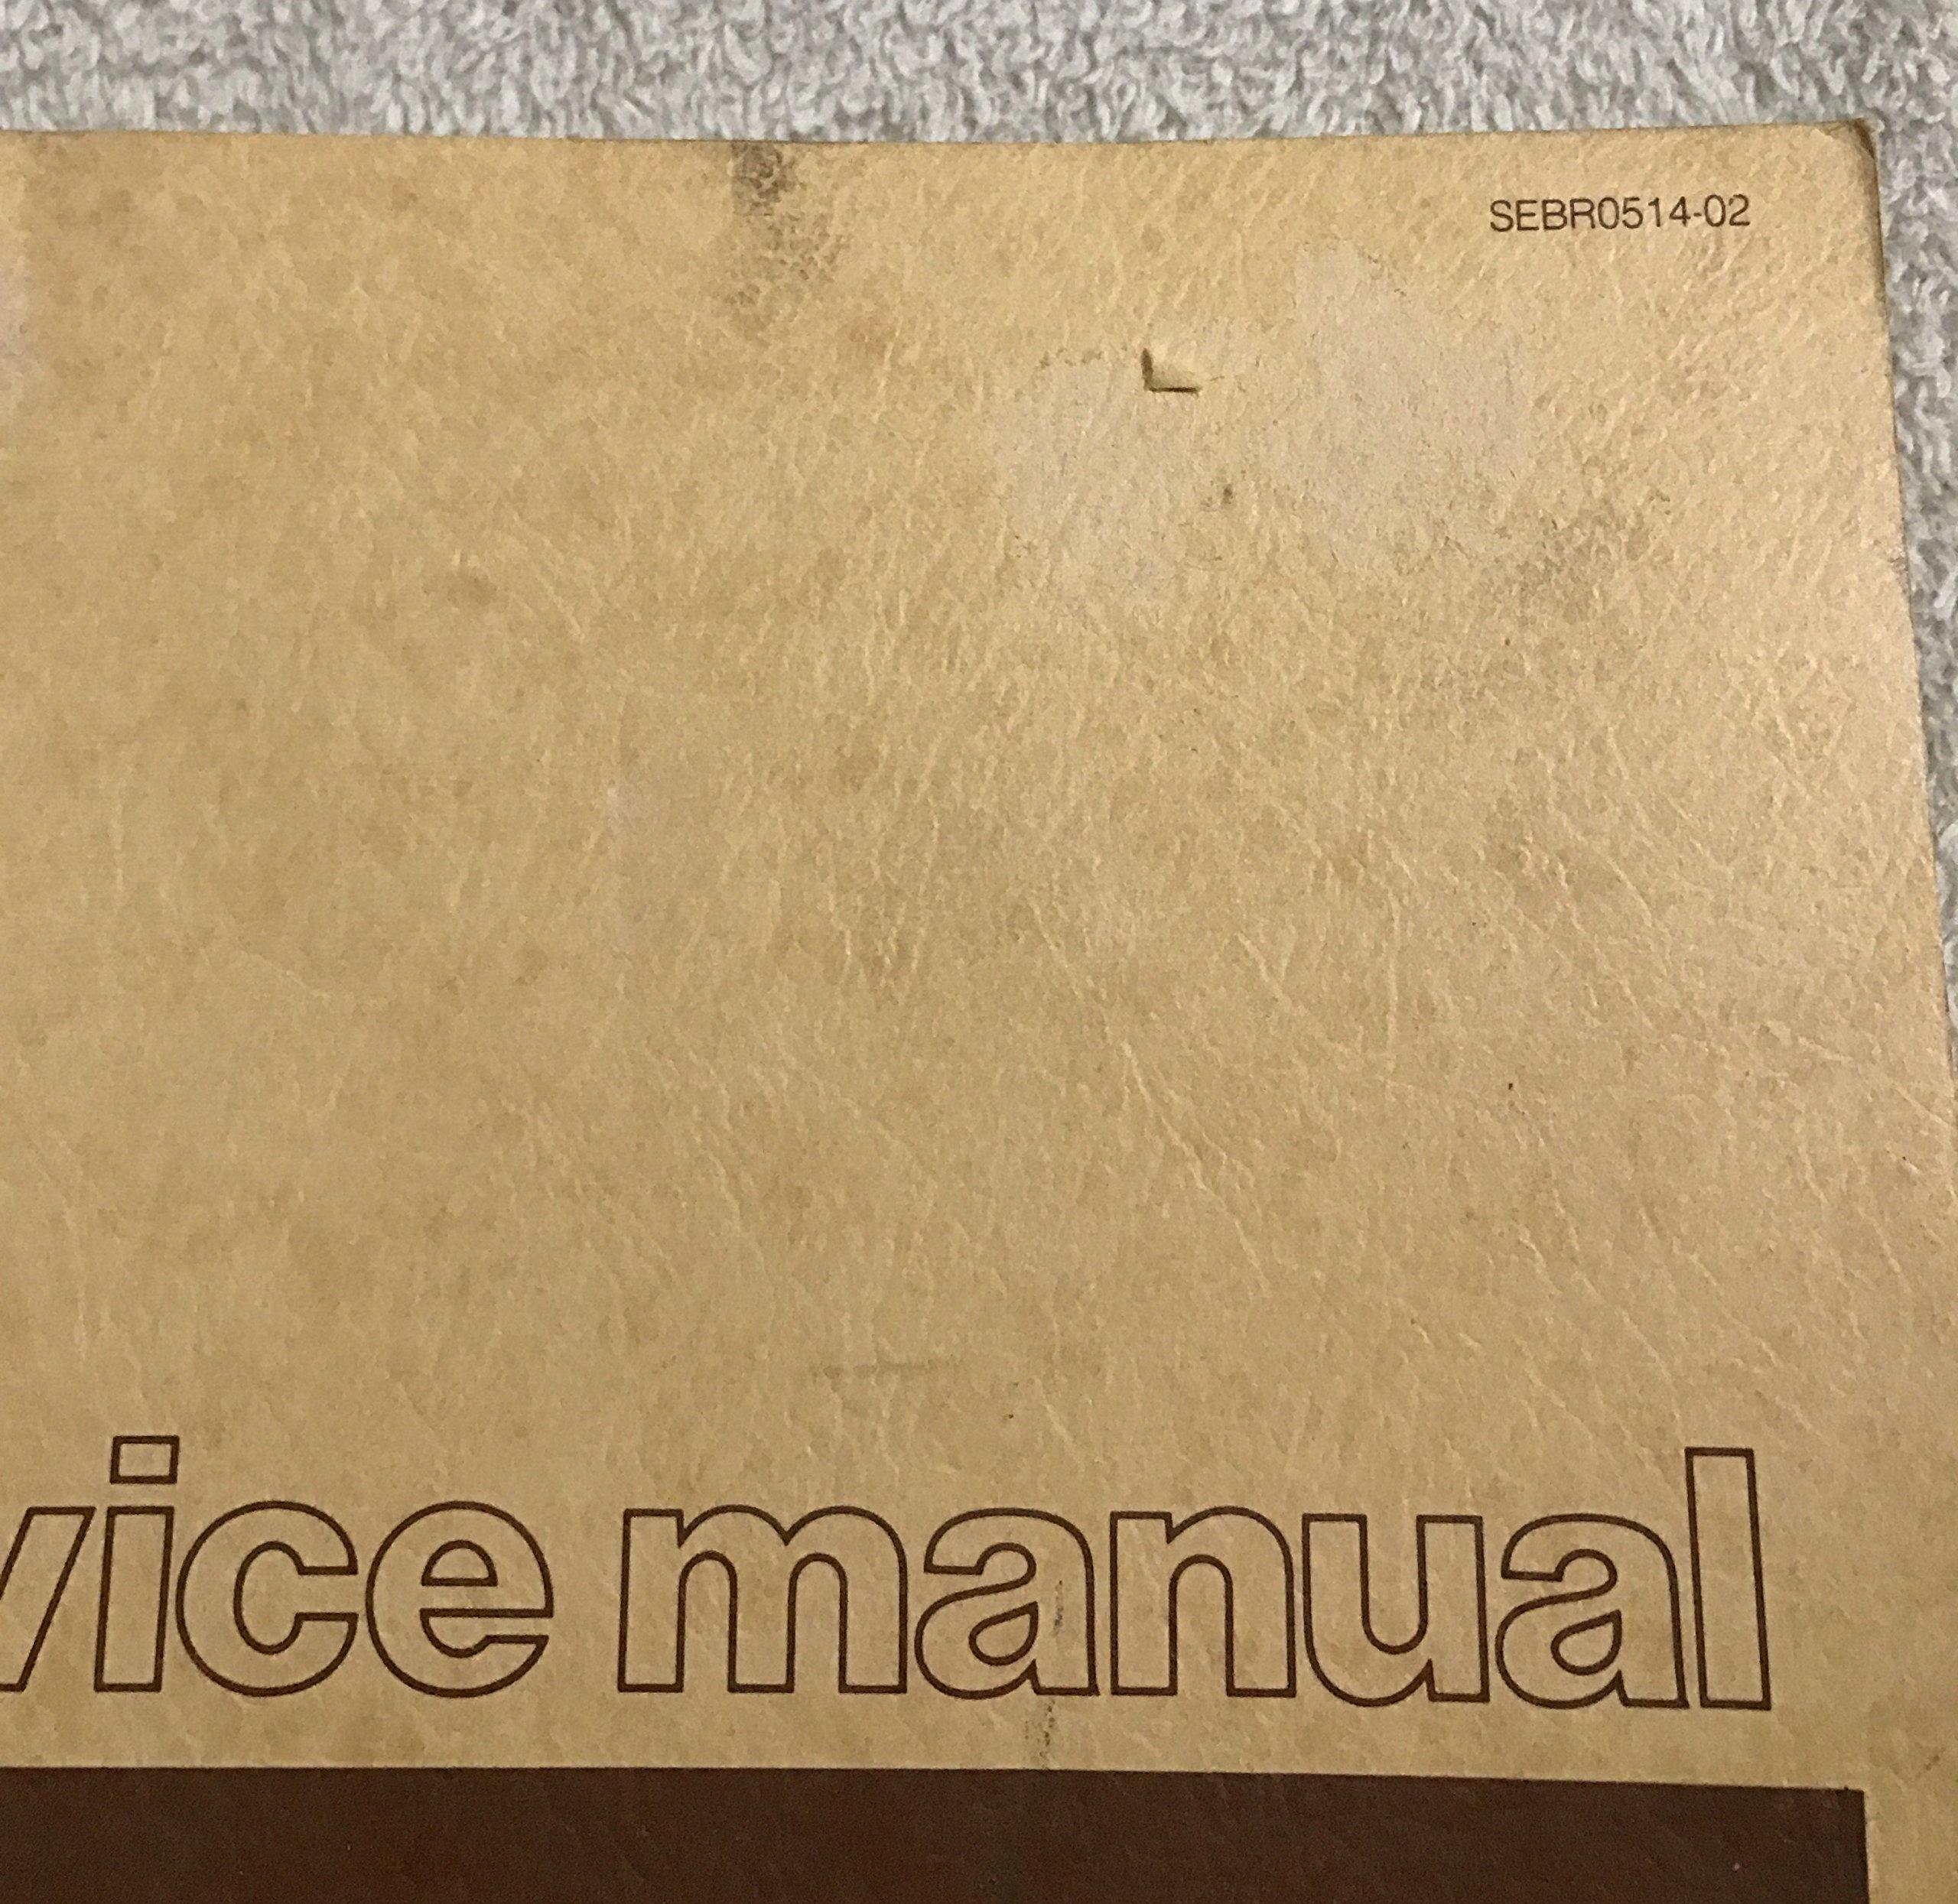 yamaha raptor 350 manual jy4ah12w050016528